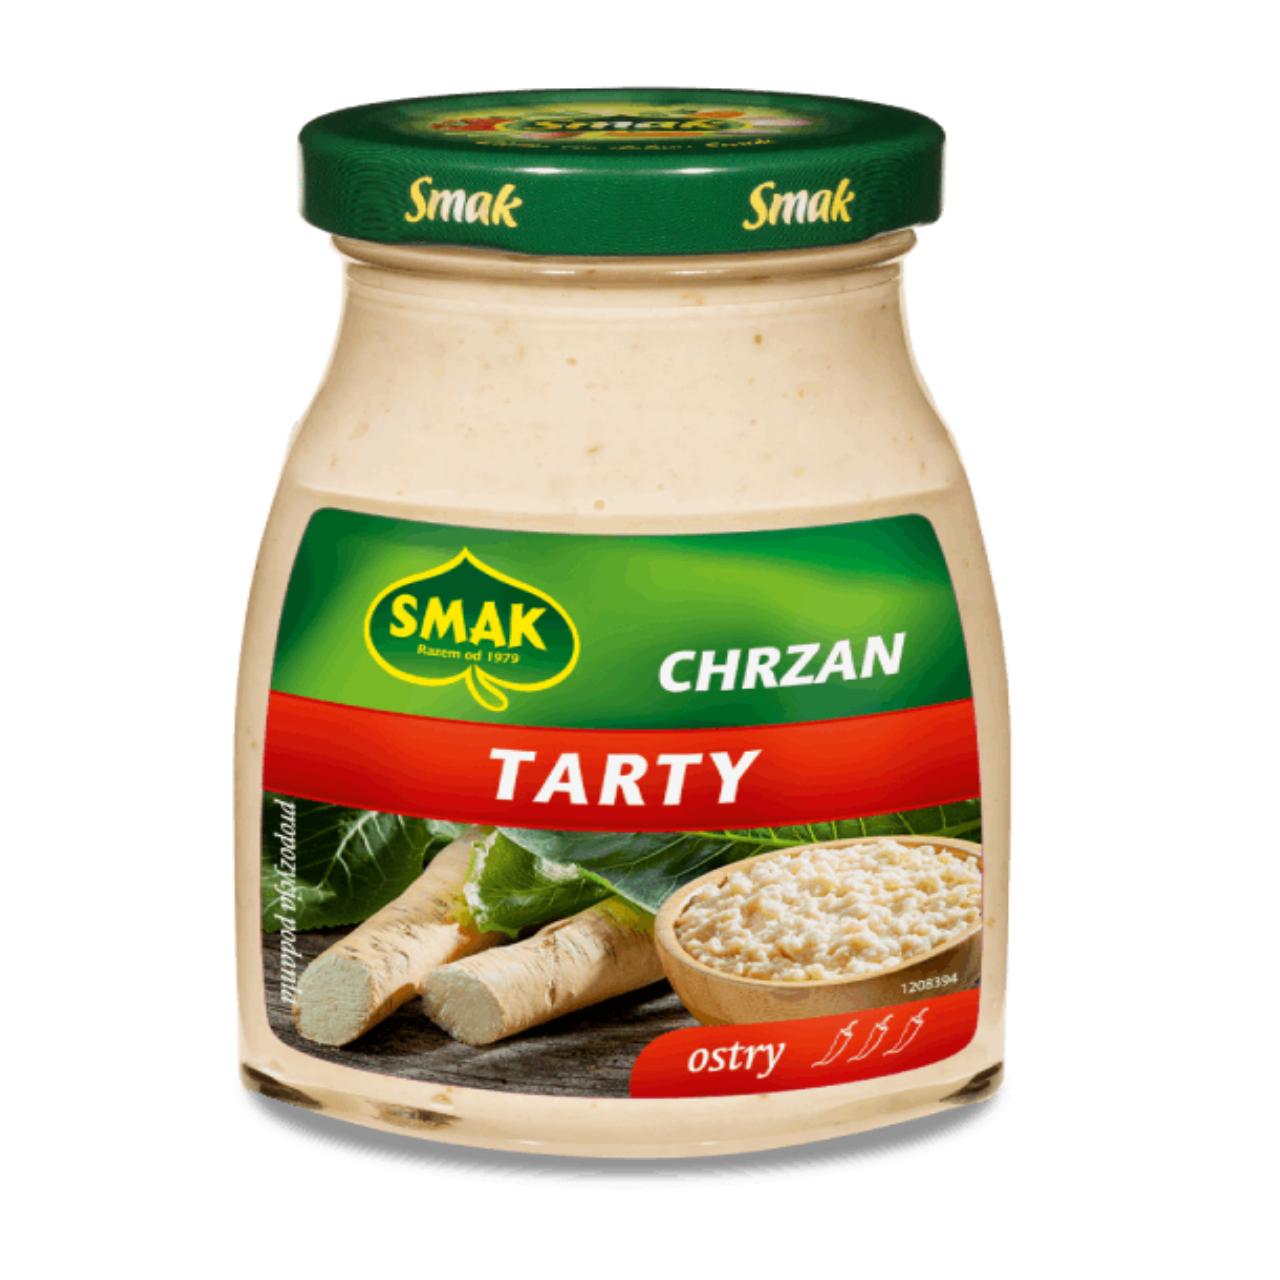 CHRZAN TARTY - SMAK 175g